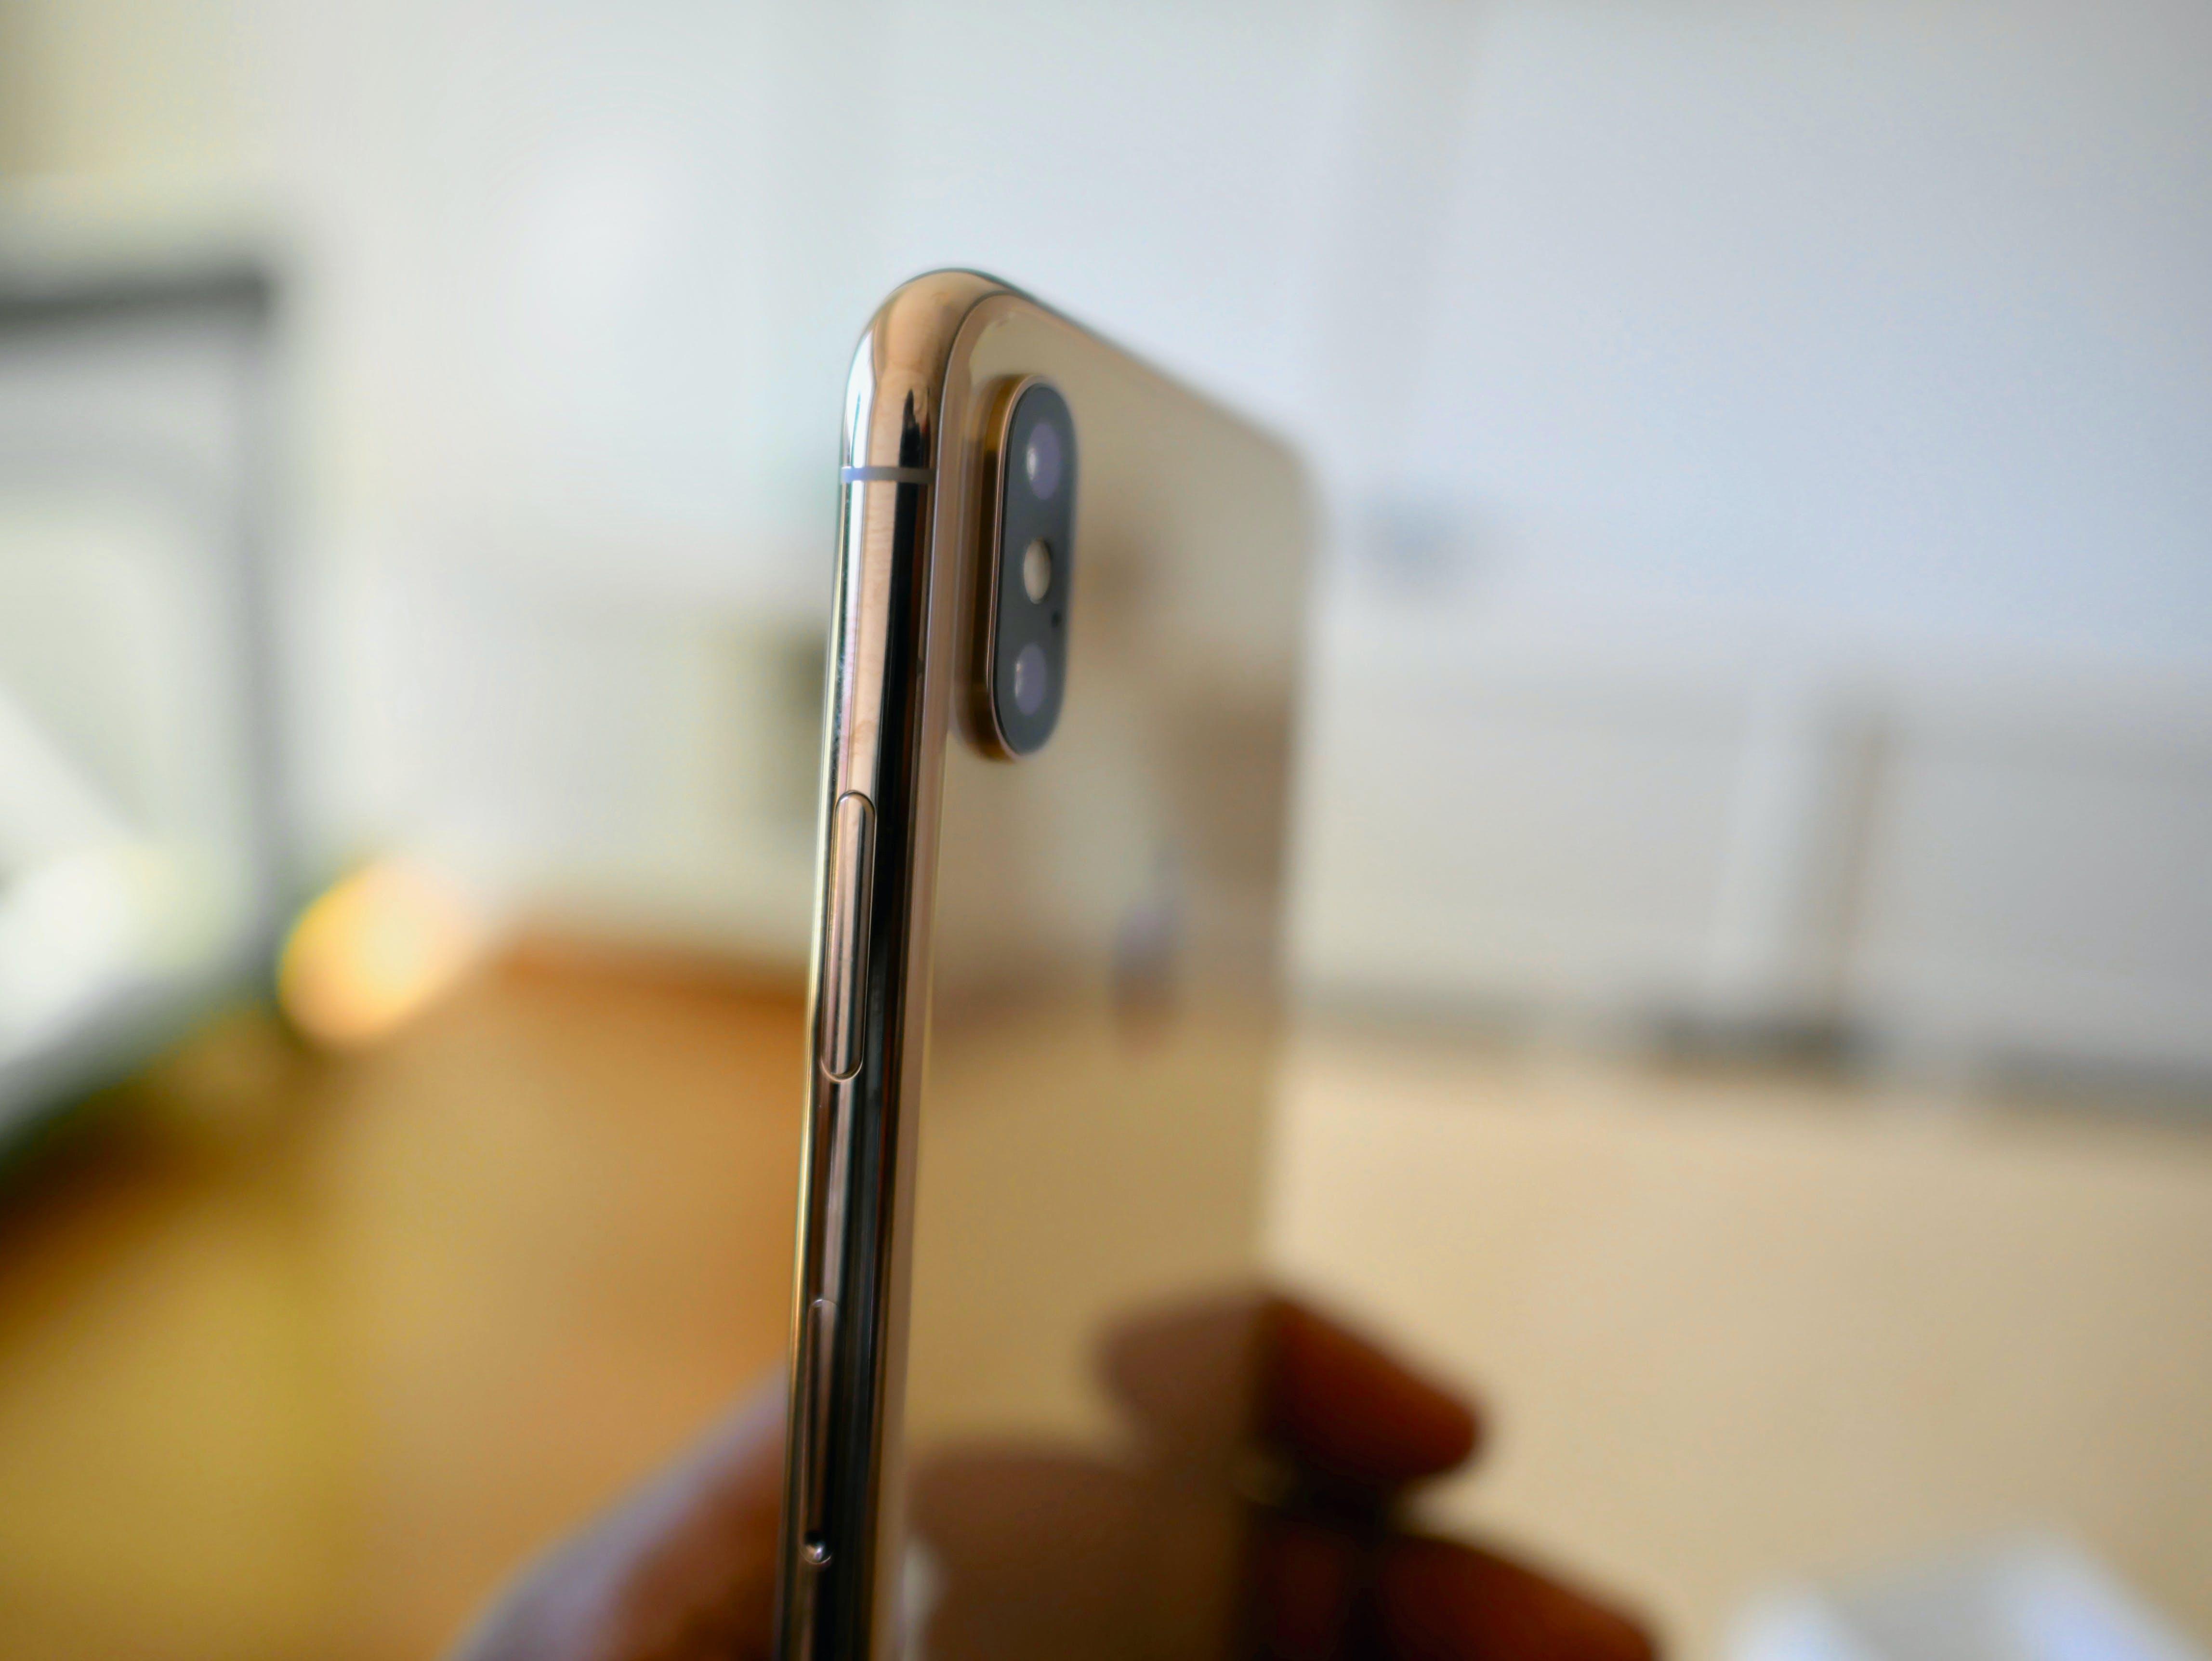 Gratis lagerfoto af guld, iOS, iPhone, iphone xs max